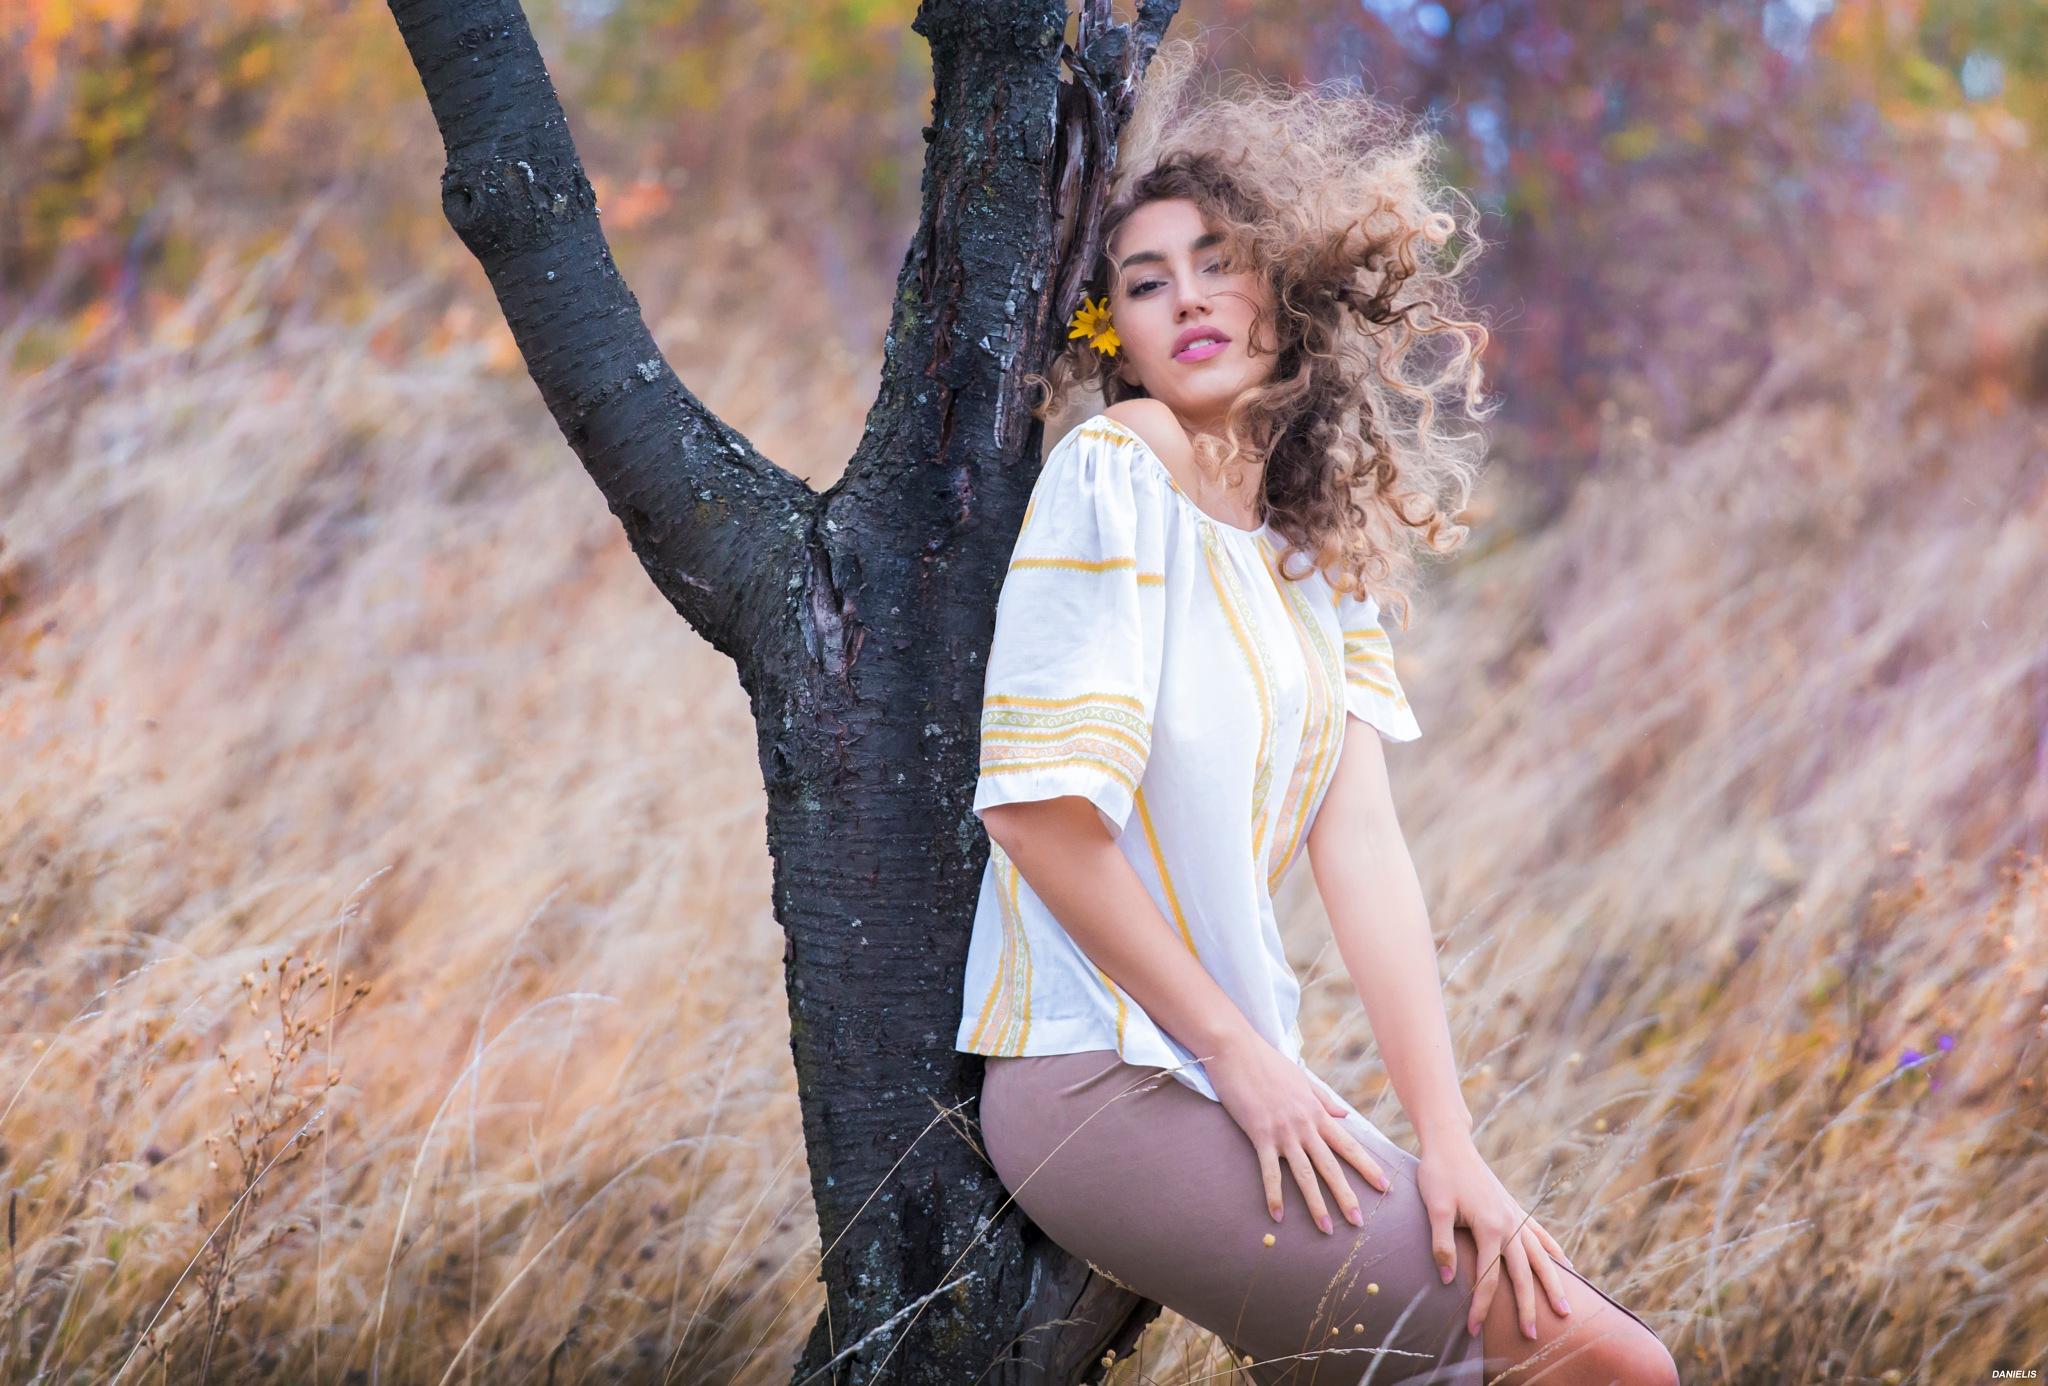 Andreea by Danielis